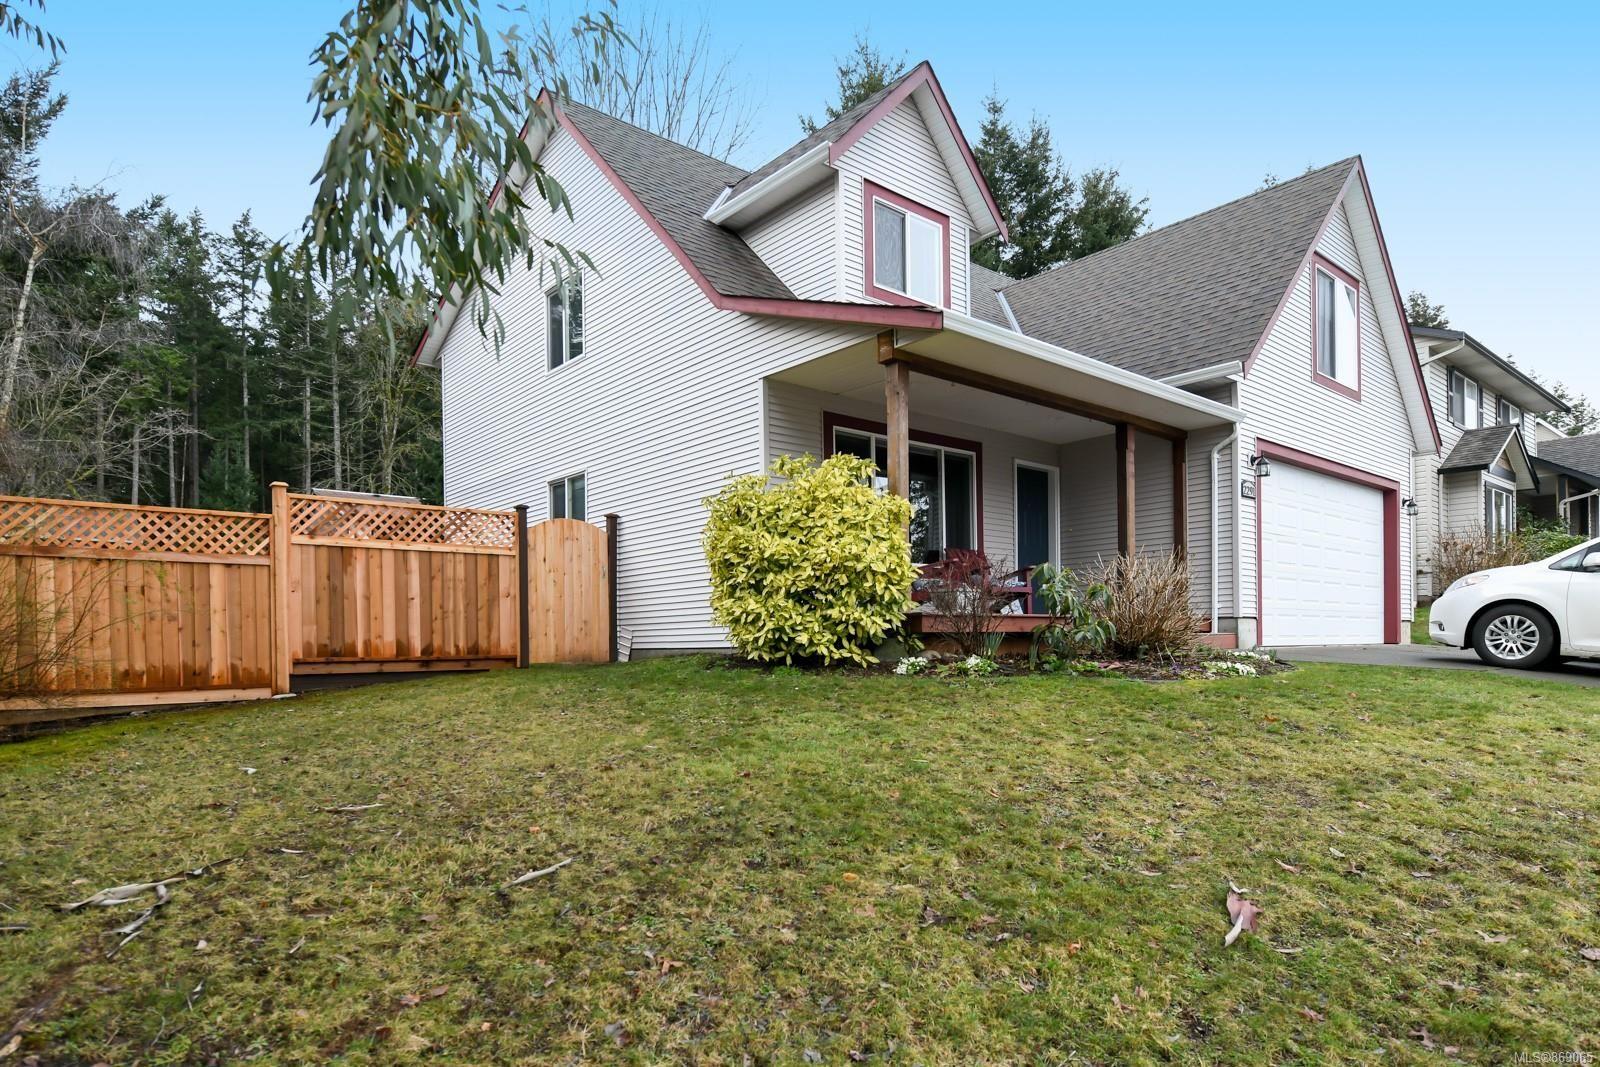 Main Photo: 2291 Heron Cres in : CV Comox (Town of) House for sale (Comox Valley)  : MLS®# 869065